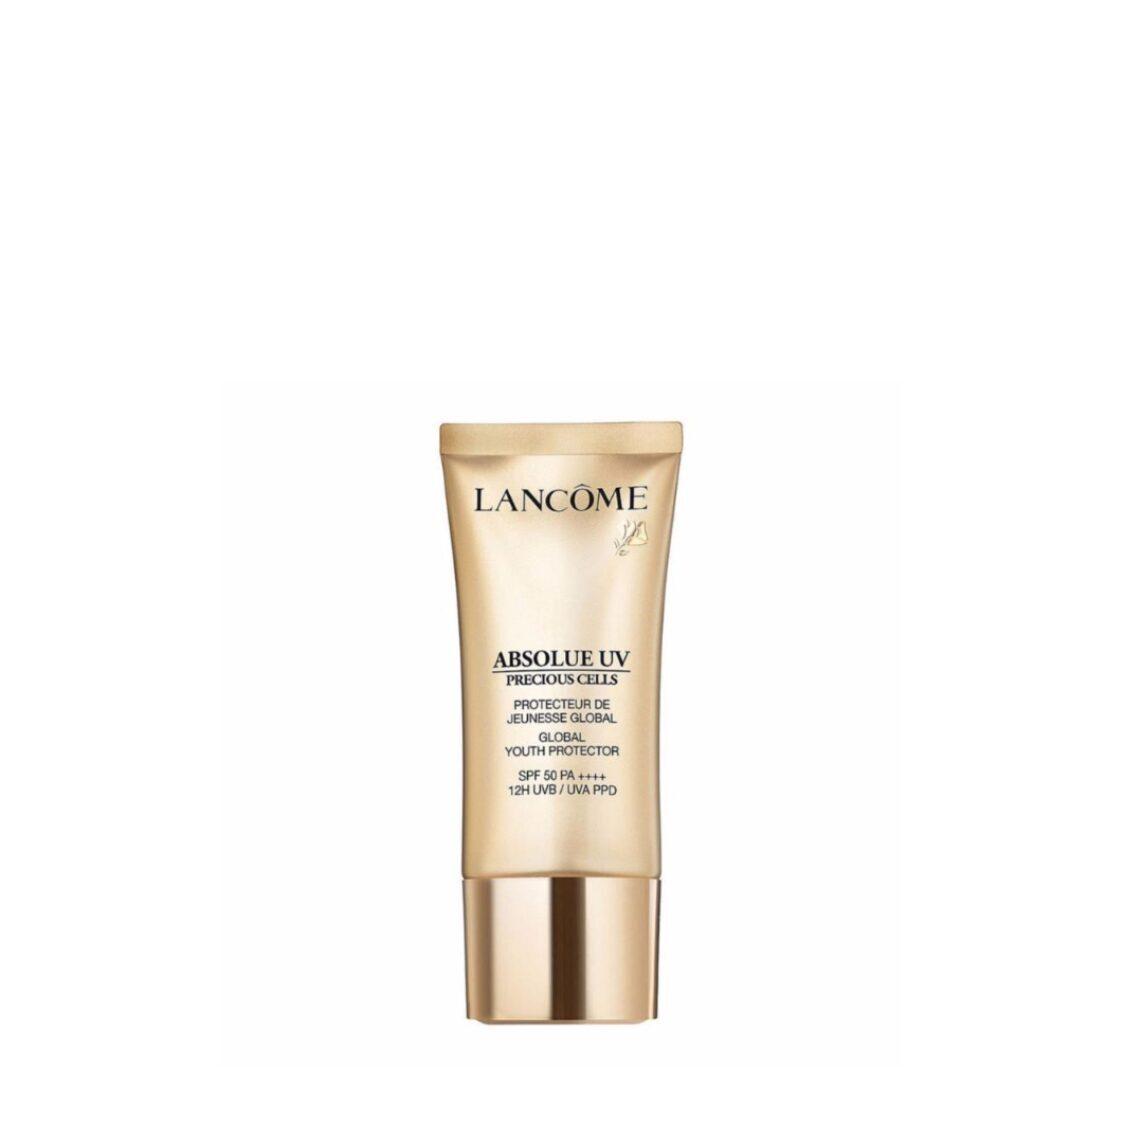 Lancome Absolue UV Precious Cells 30ml